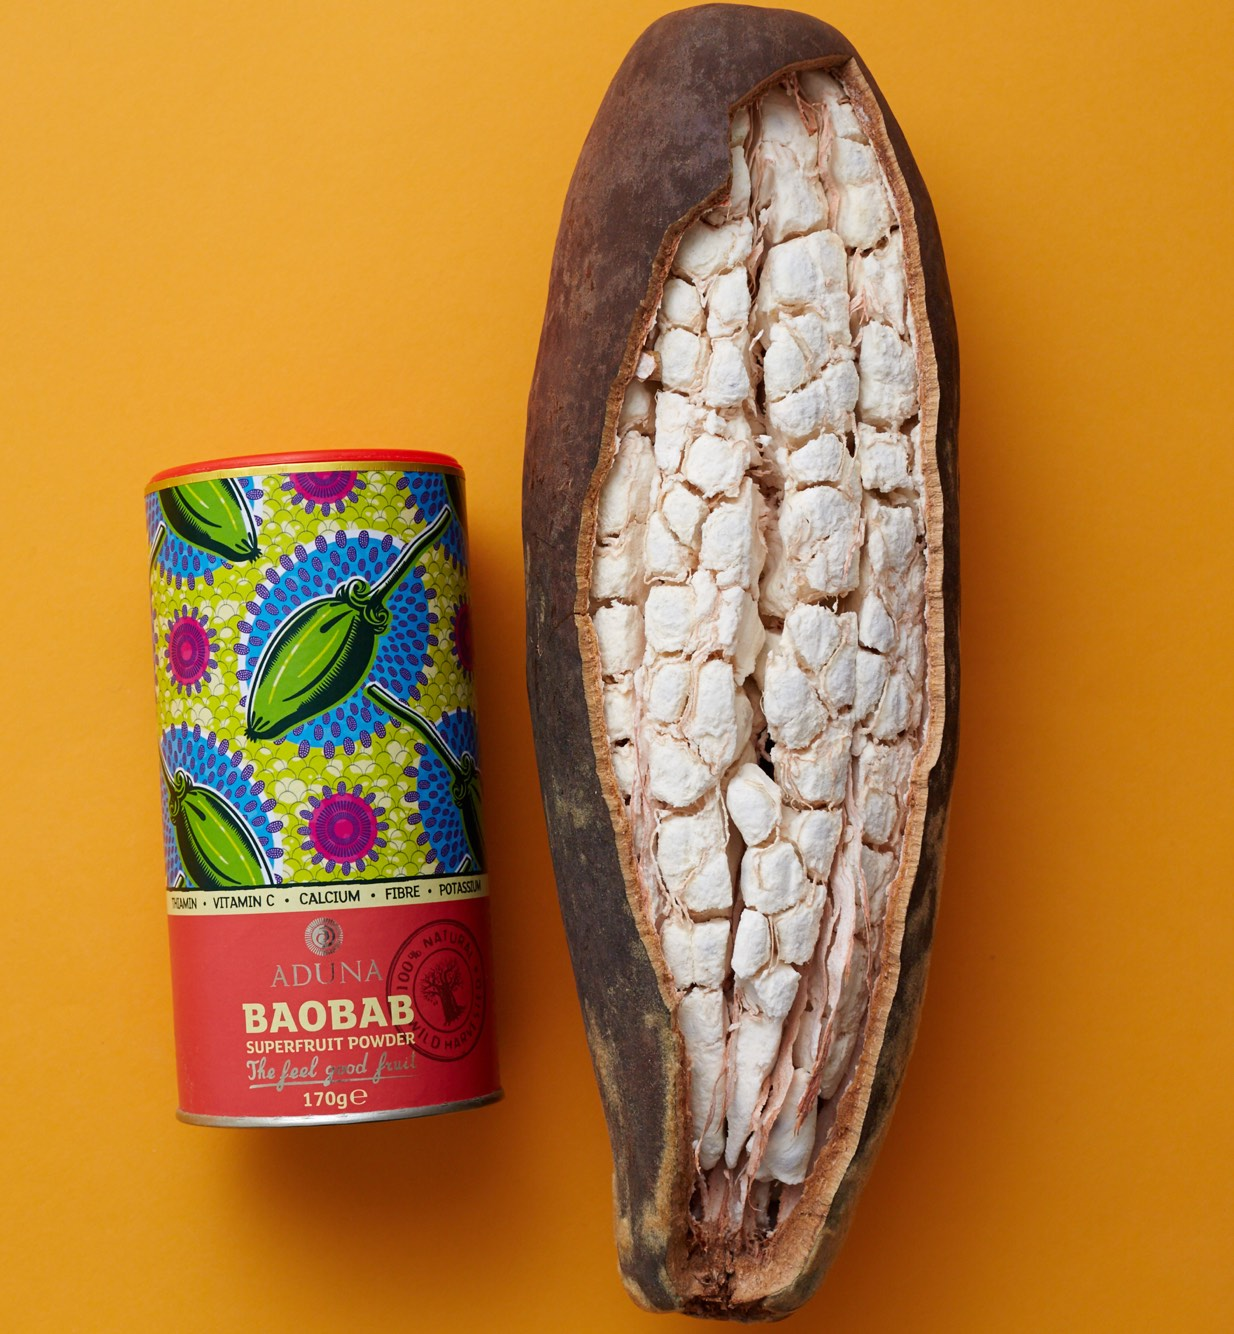 Баобаб – антиоксидант со вкусом щербета